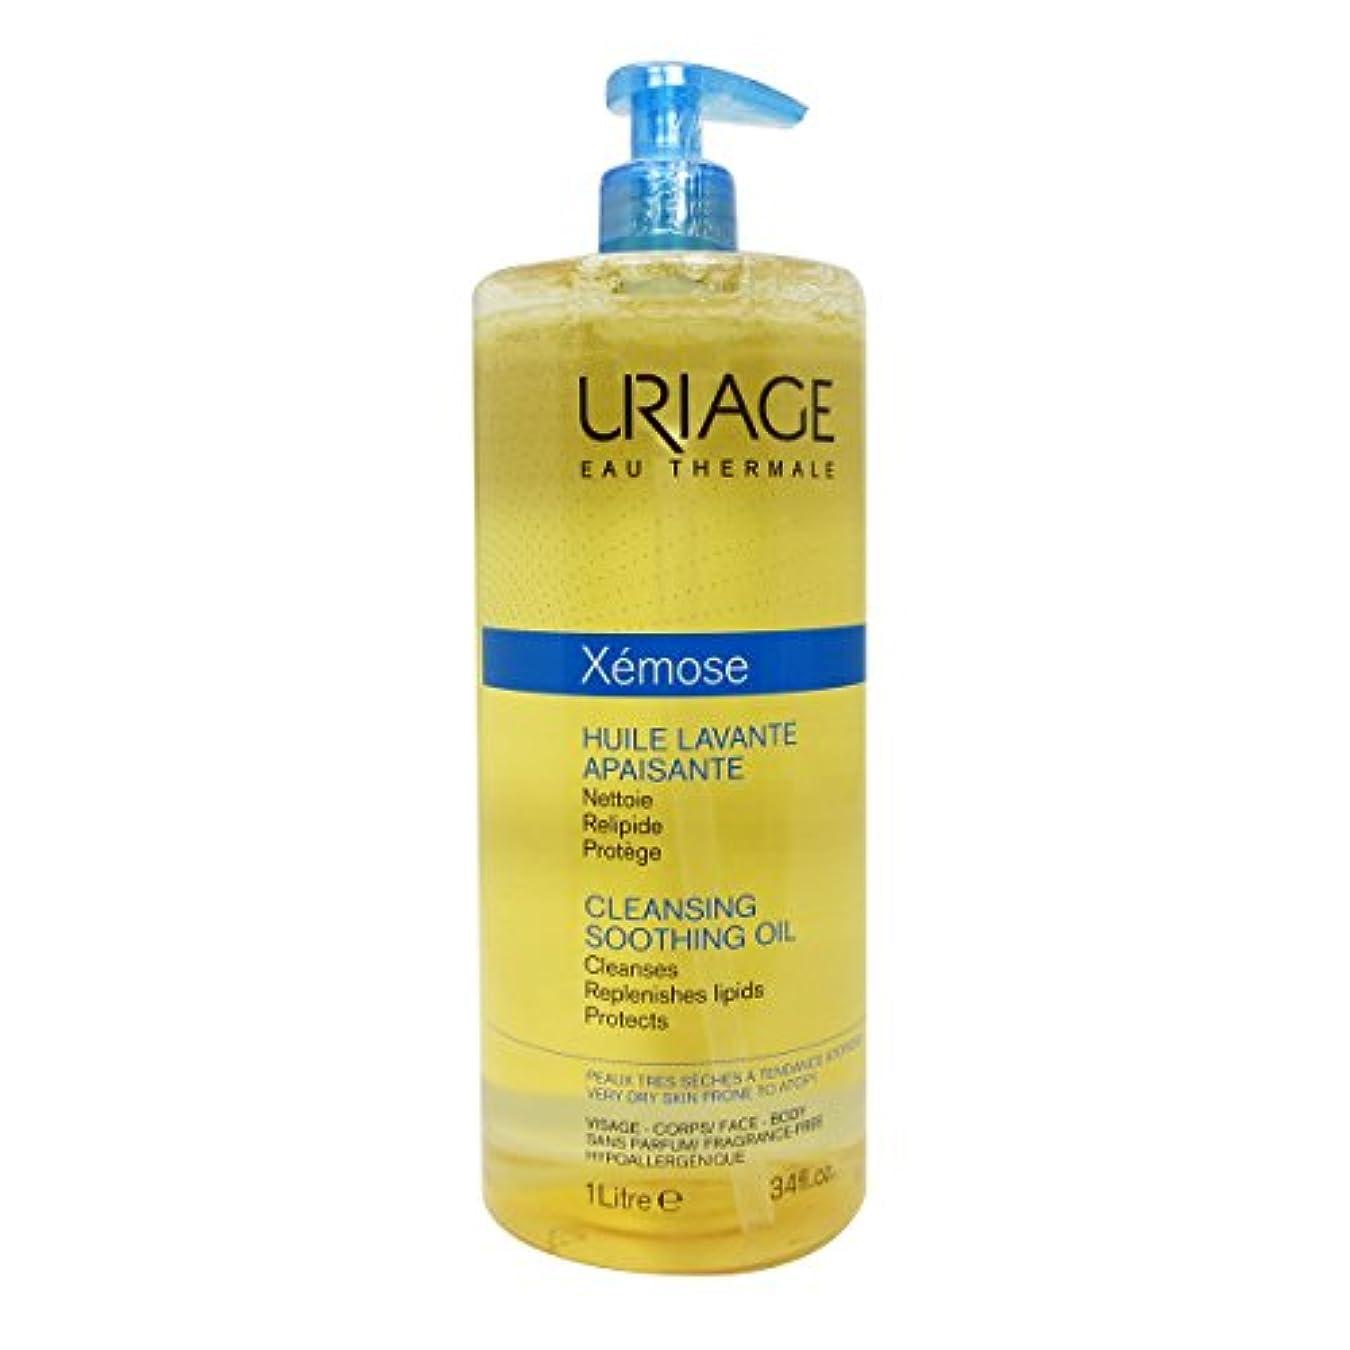 Uriage Xemose Smoothing Cleansing Oil 1000ml [並行輸入品]